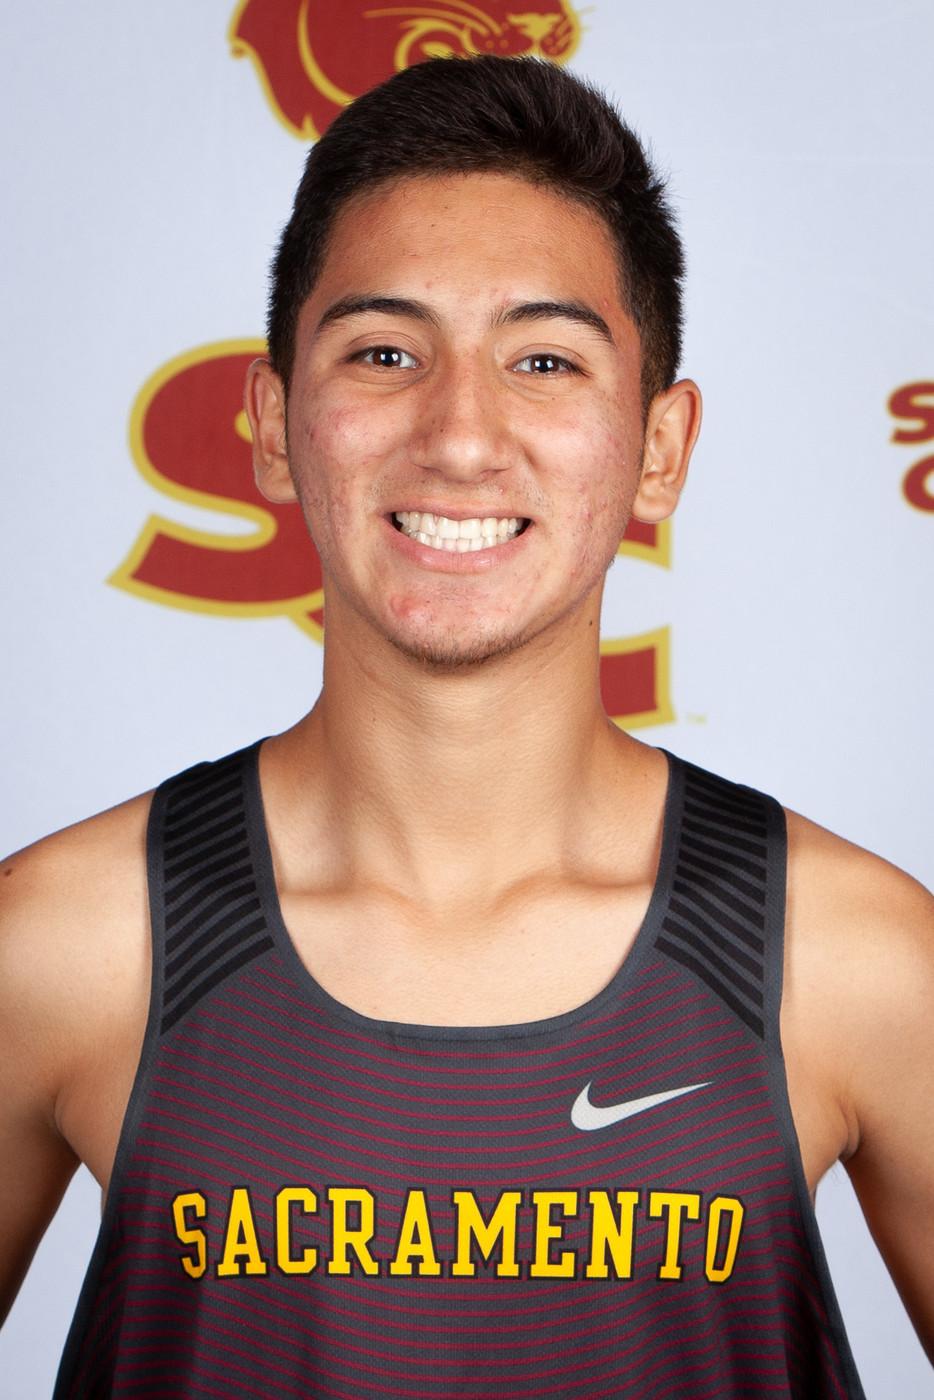 2019 Men's Cross Country Roster - Sacramento City College